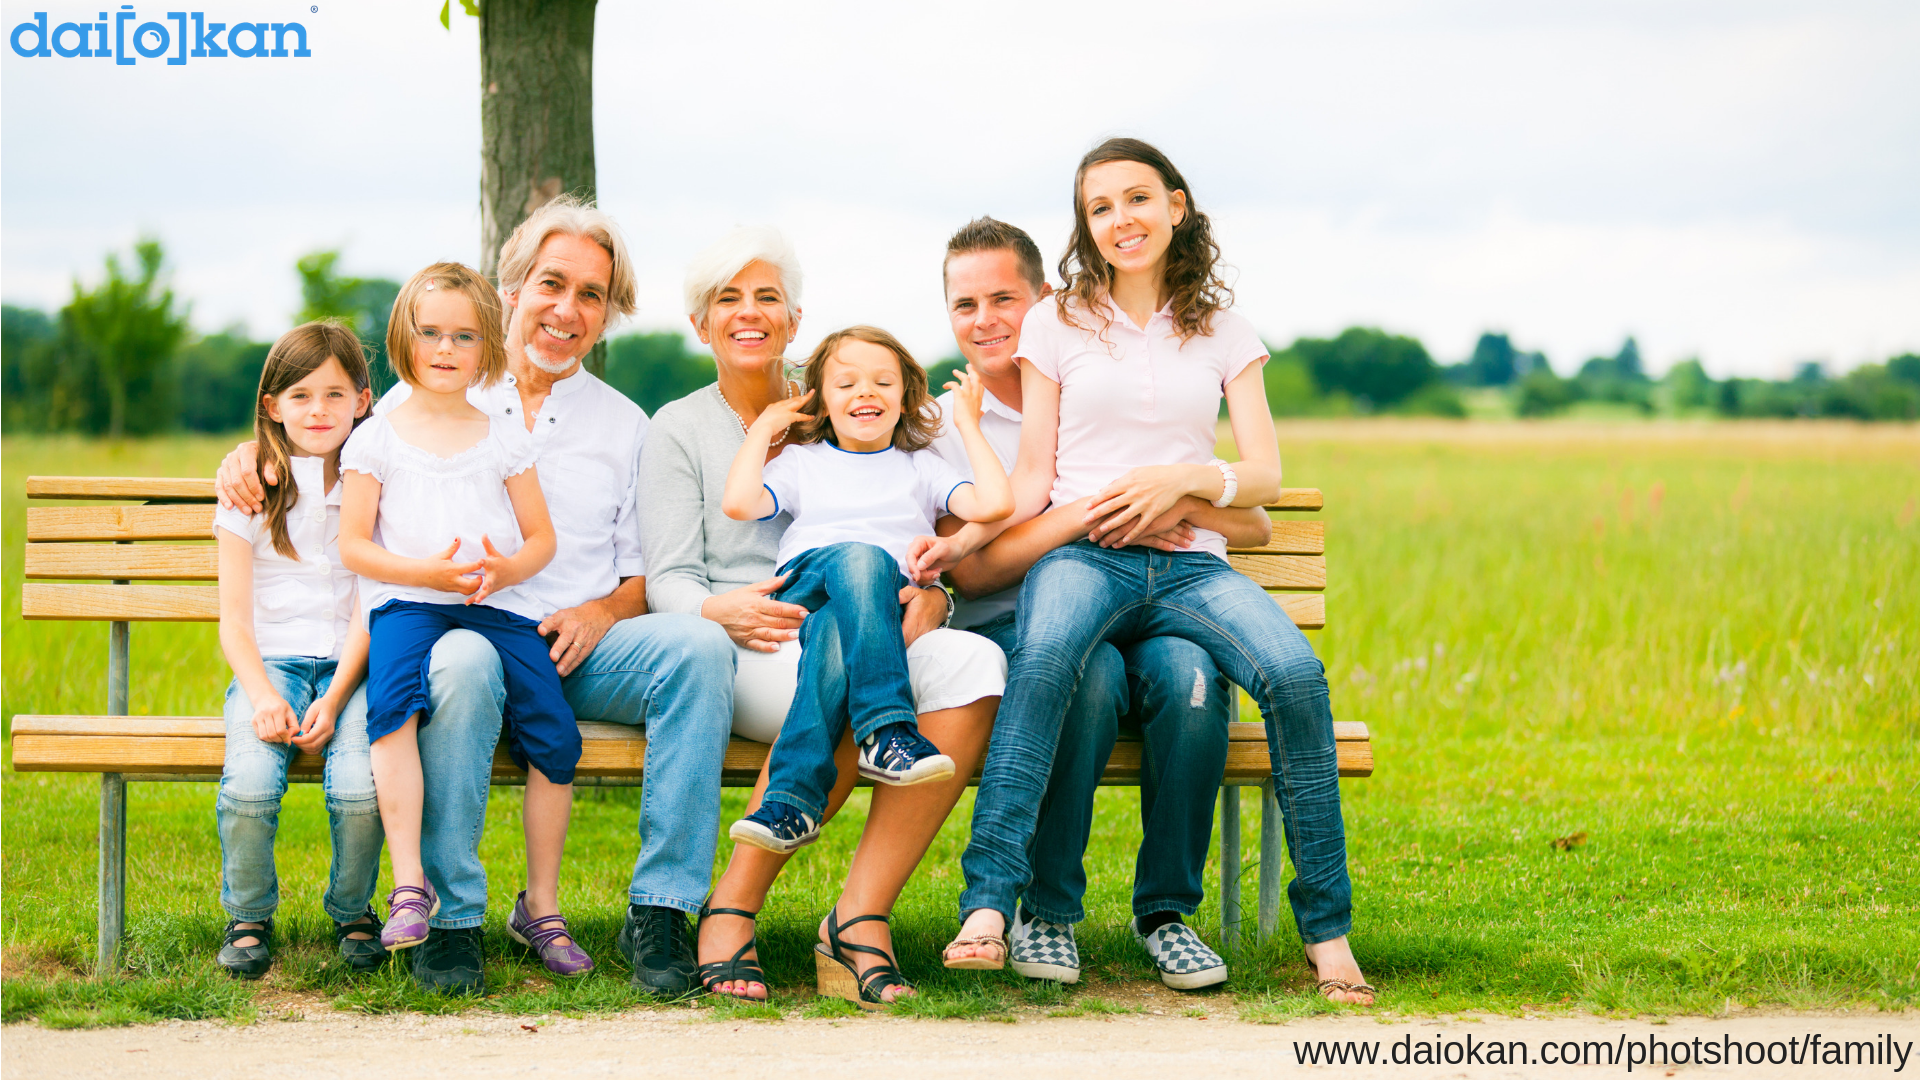 Big Happy Family Photo On Bench